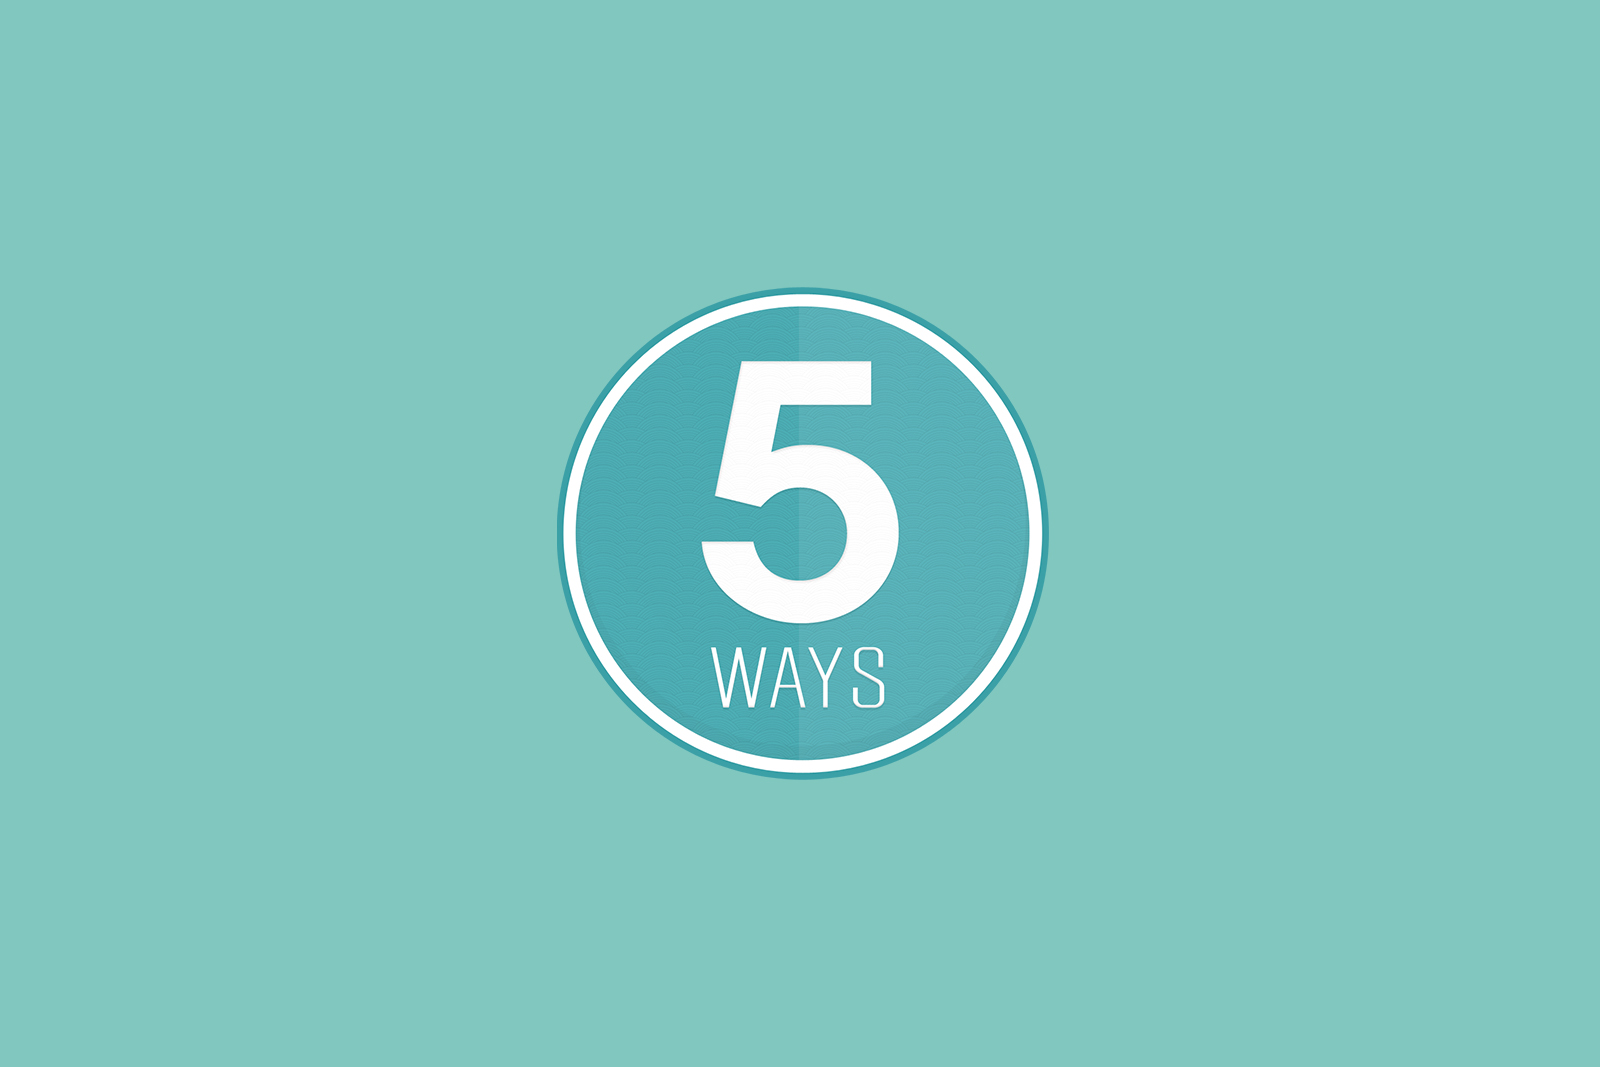 5 ways.jpg